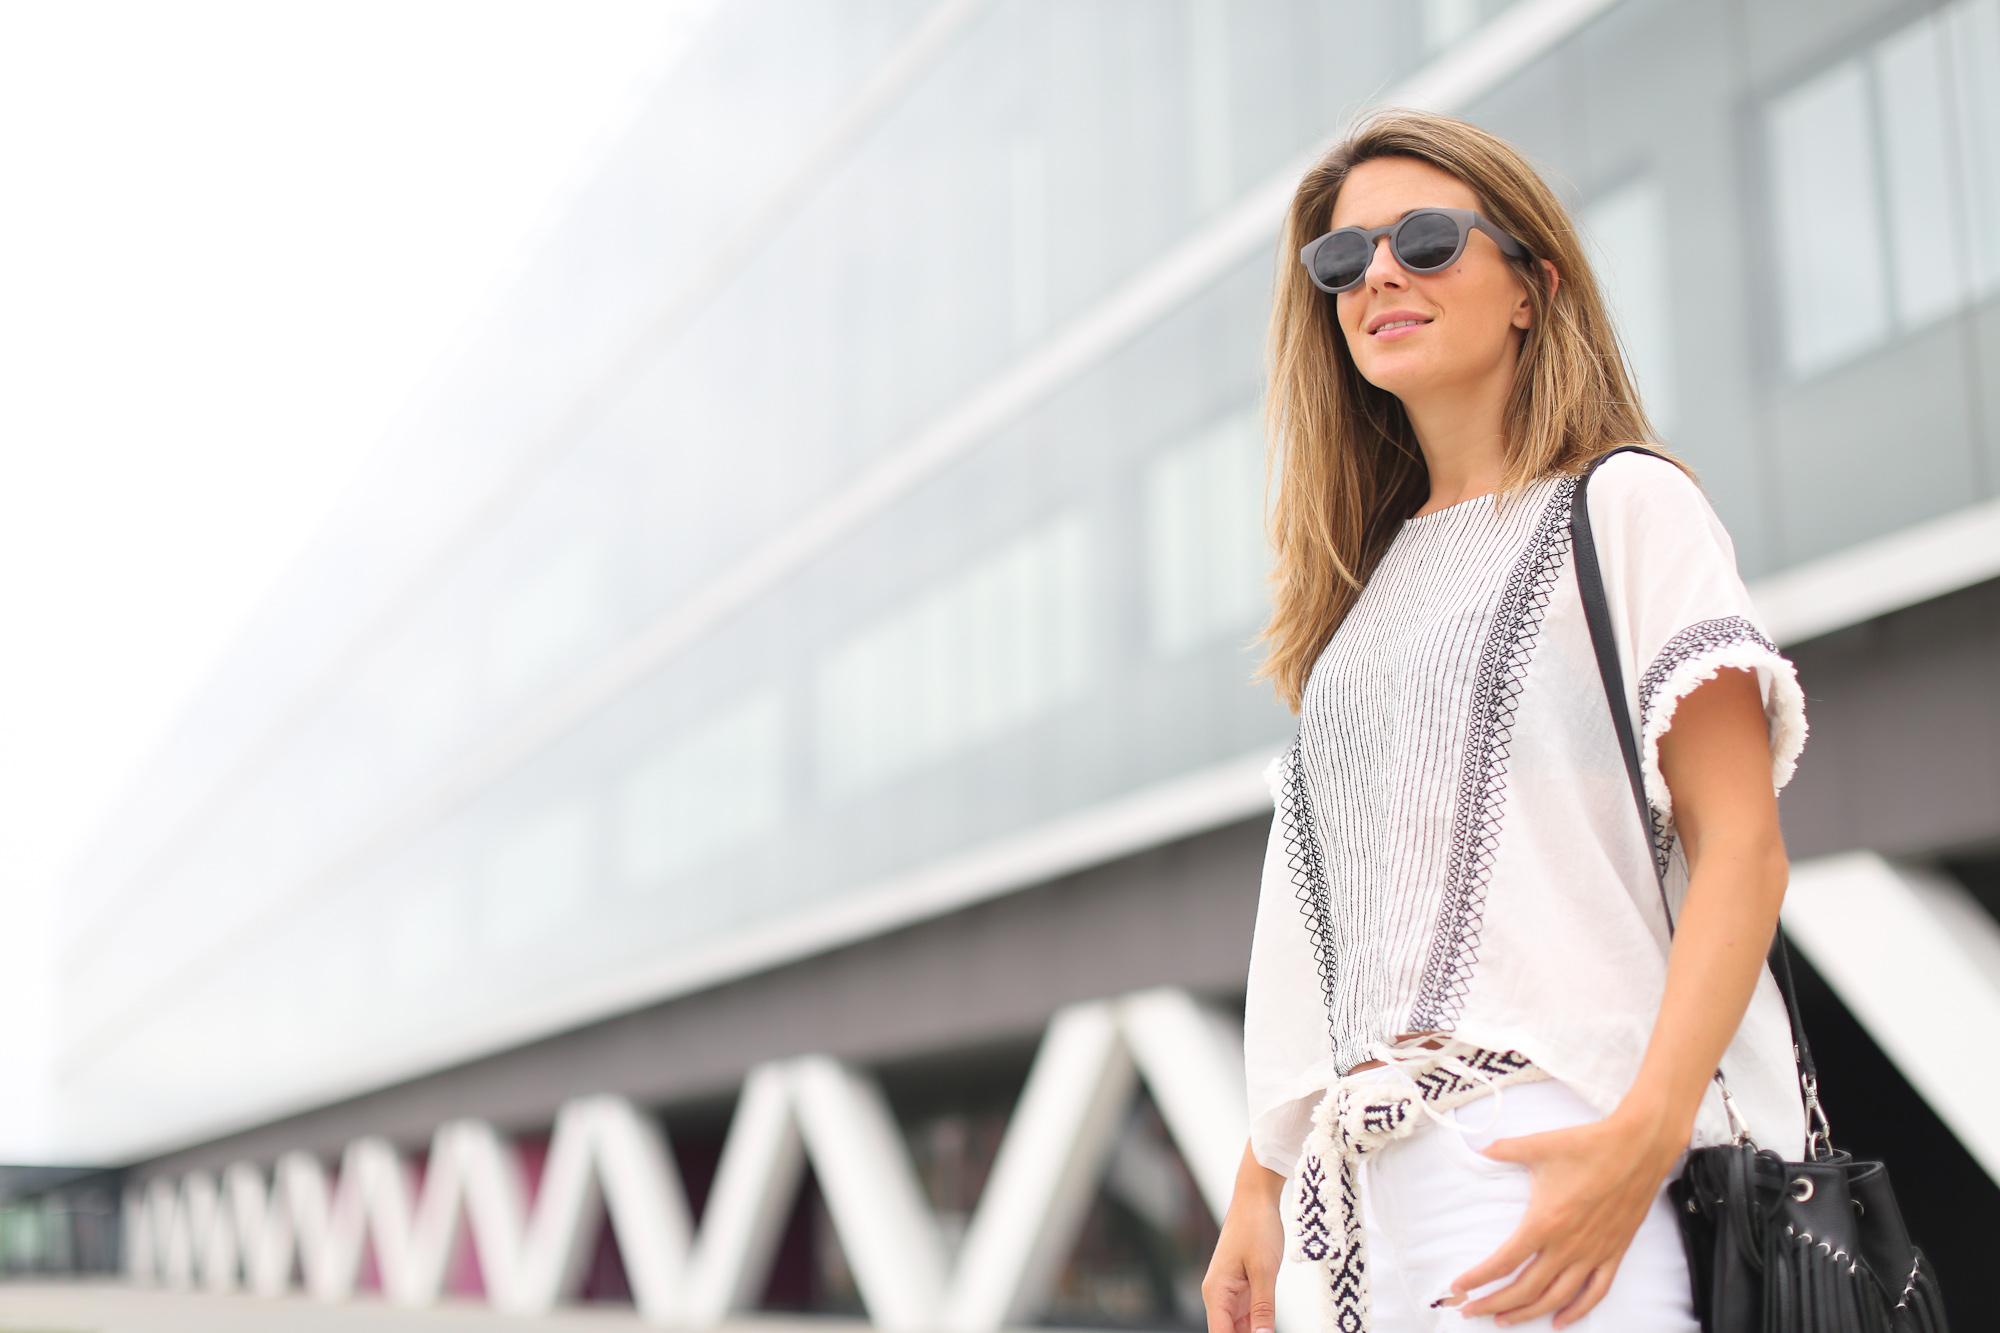 Clochet_streetstyle_zara_boho_top_vintage_grey_adidas_gazelle_leztinstreet_sandro_fringed_anik_bag-4